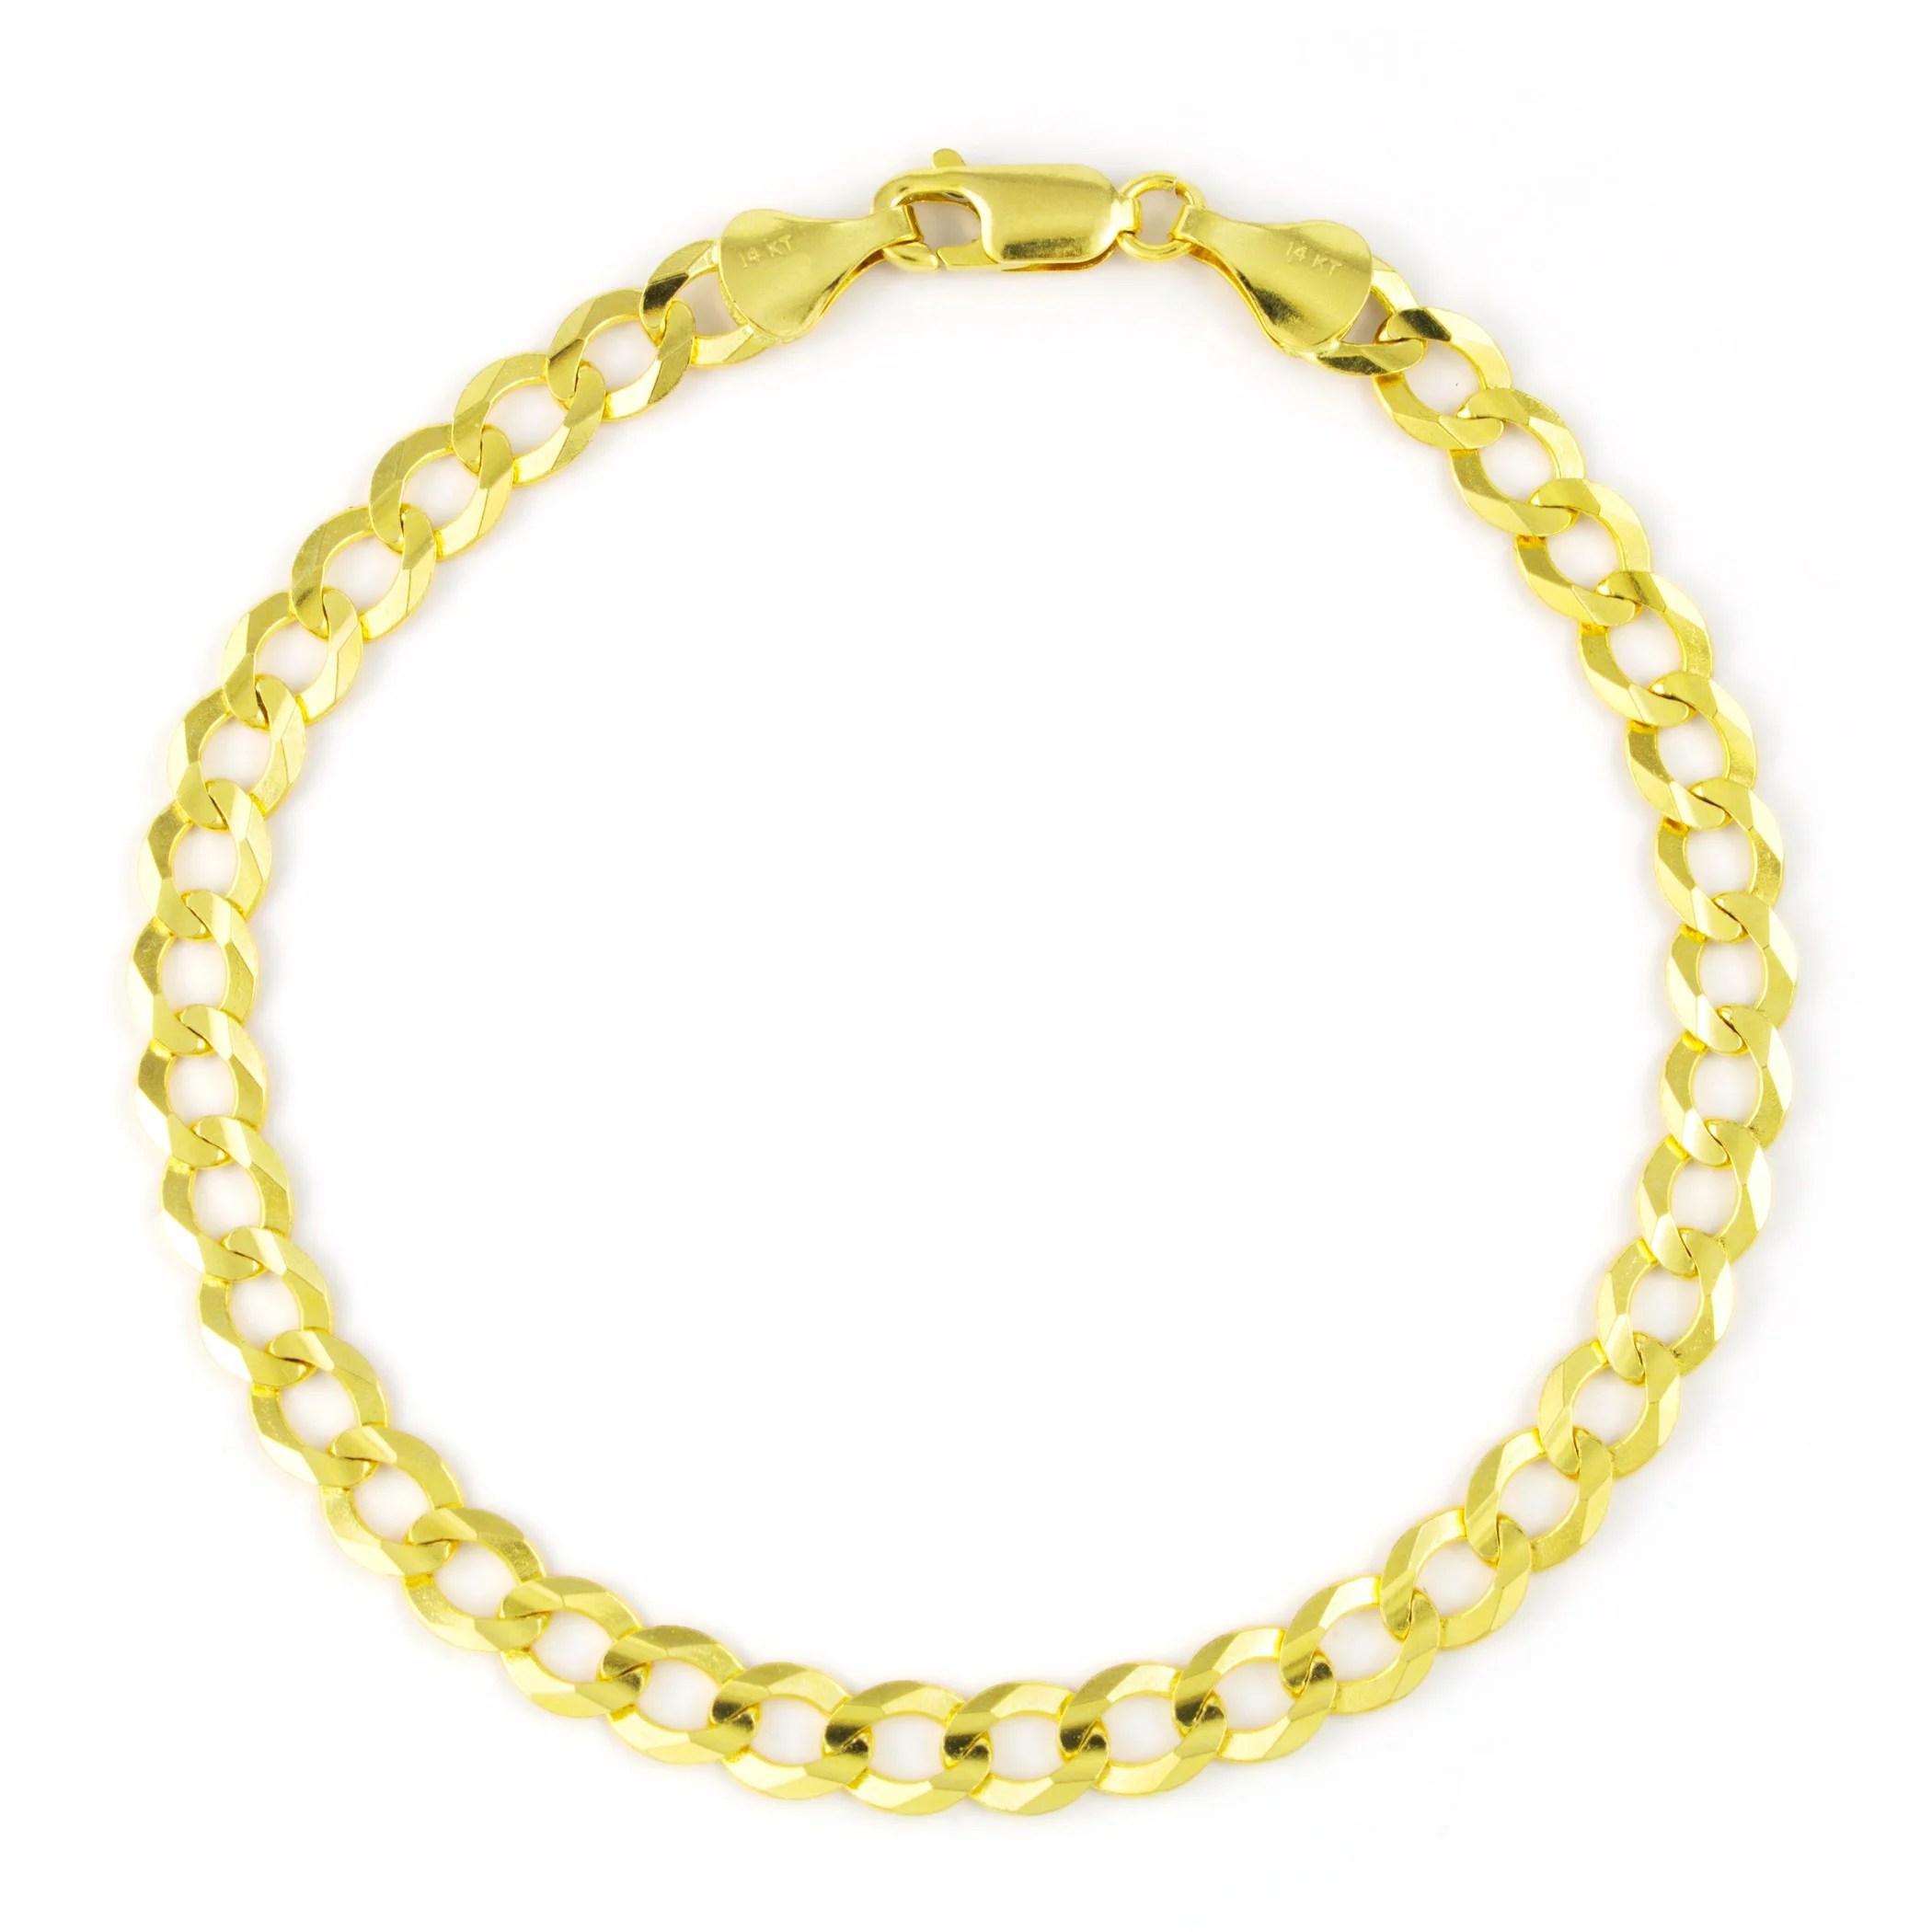 14k yellow gold solid 6mm curb cuban chain bracelet men or women 8 8 5 9